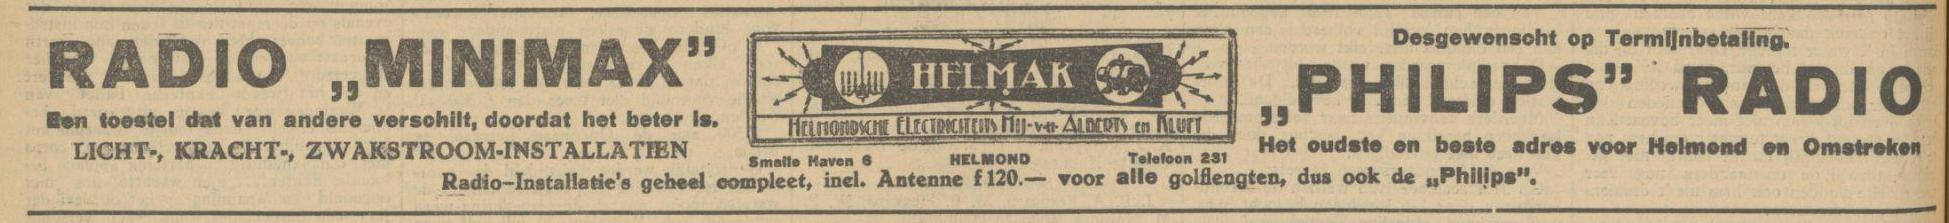 19290729